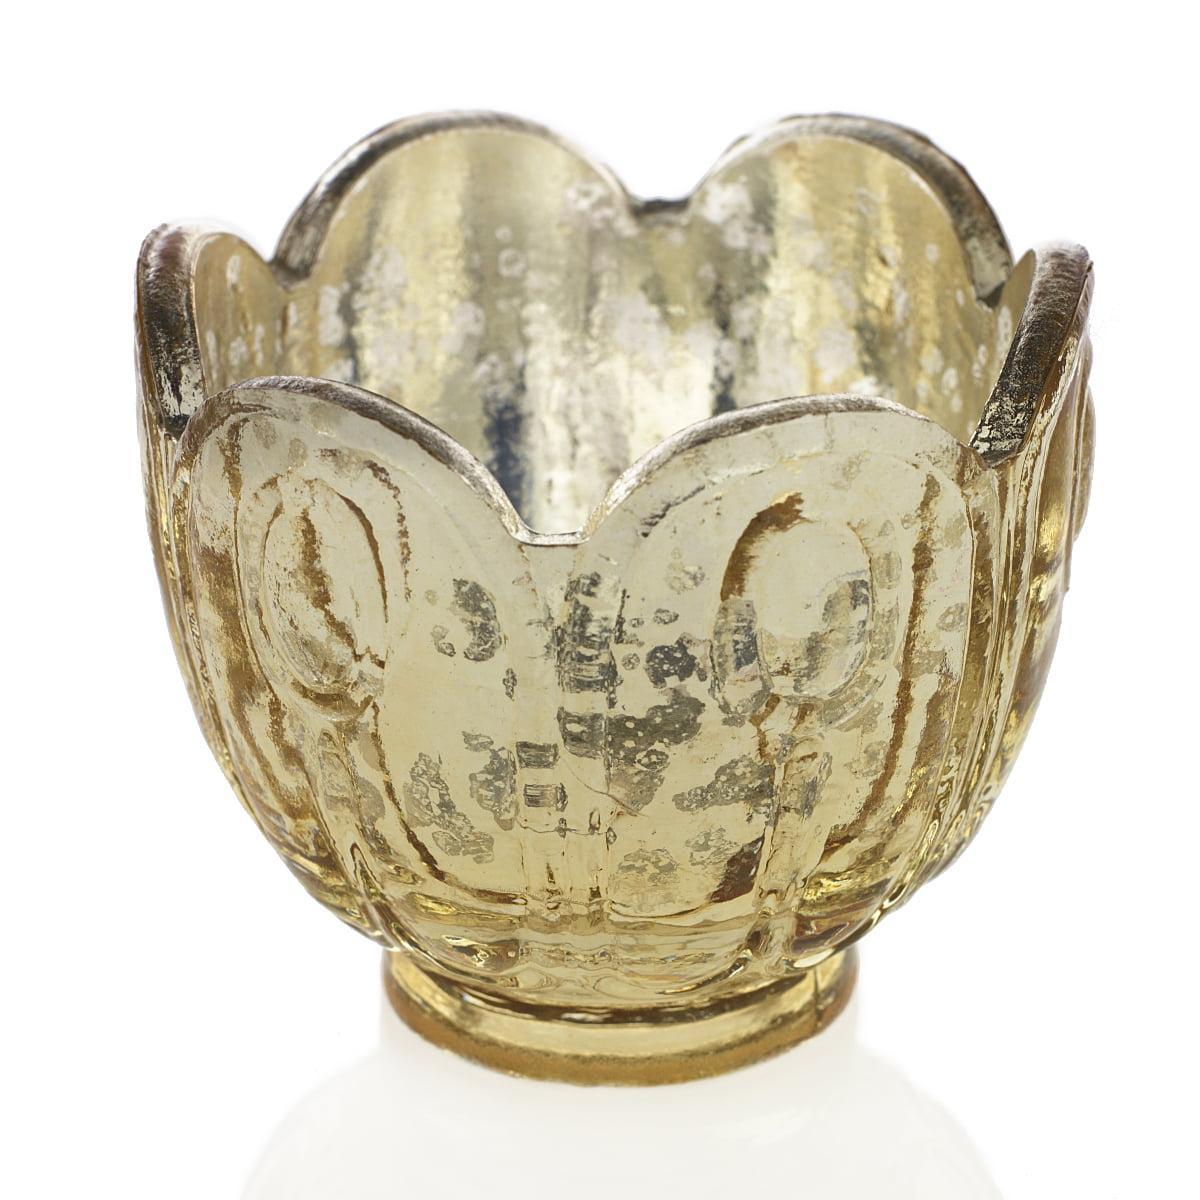 275 gold mercury glass tea light candle holder blossom bud vase 275 gold mercury glass tea light candle holder blossom bud vase 6 pack walmart reviewsmspy